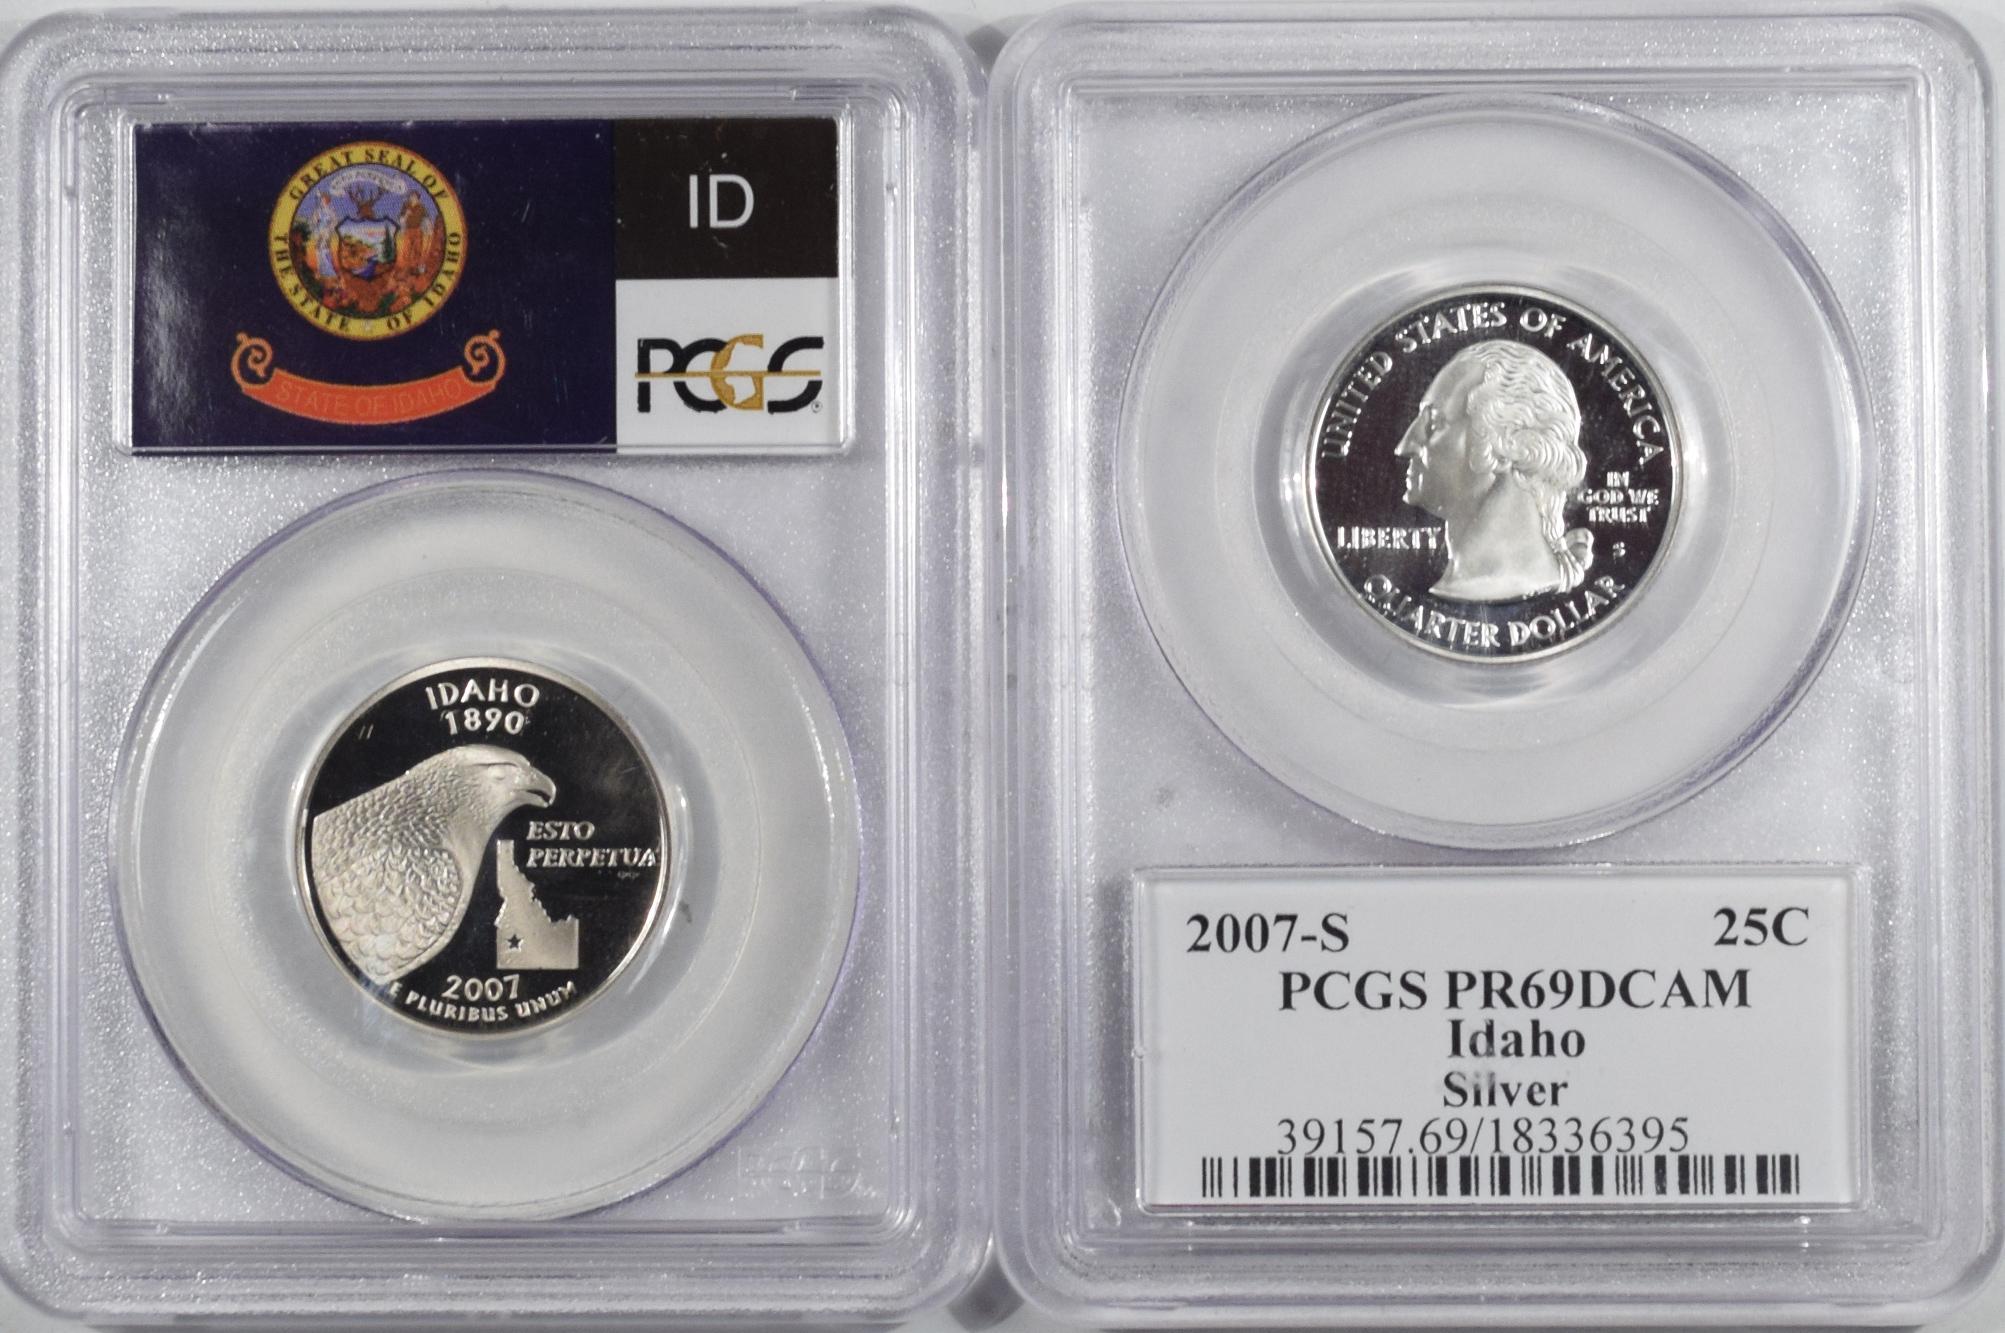 2007-S Idaho Clad  Proof State Quarter PCGS PR69DCAM